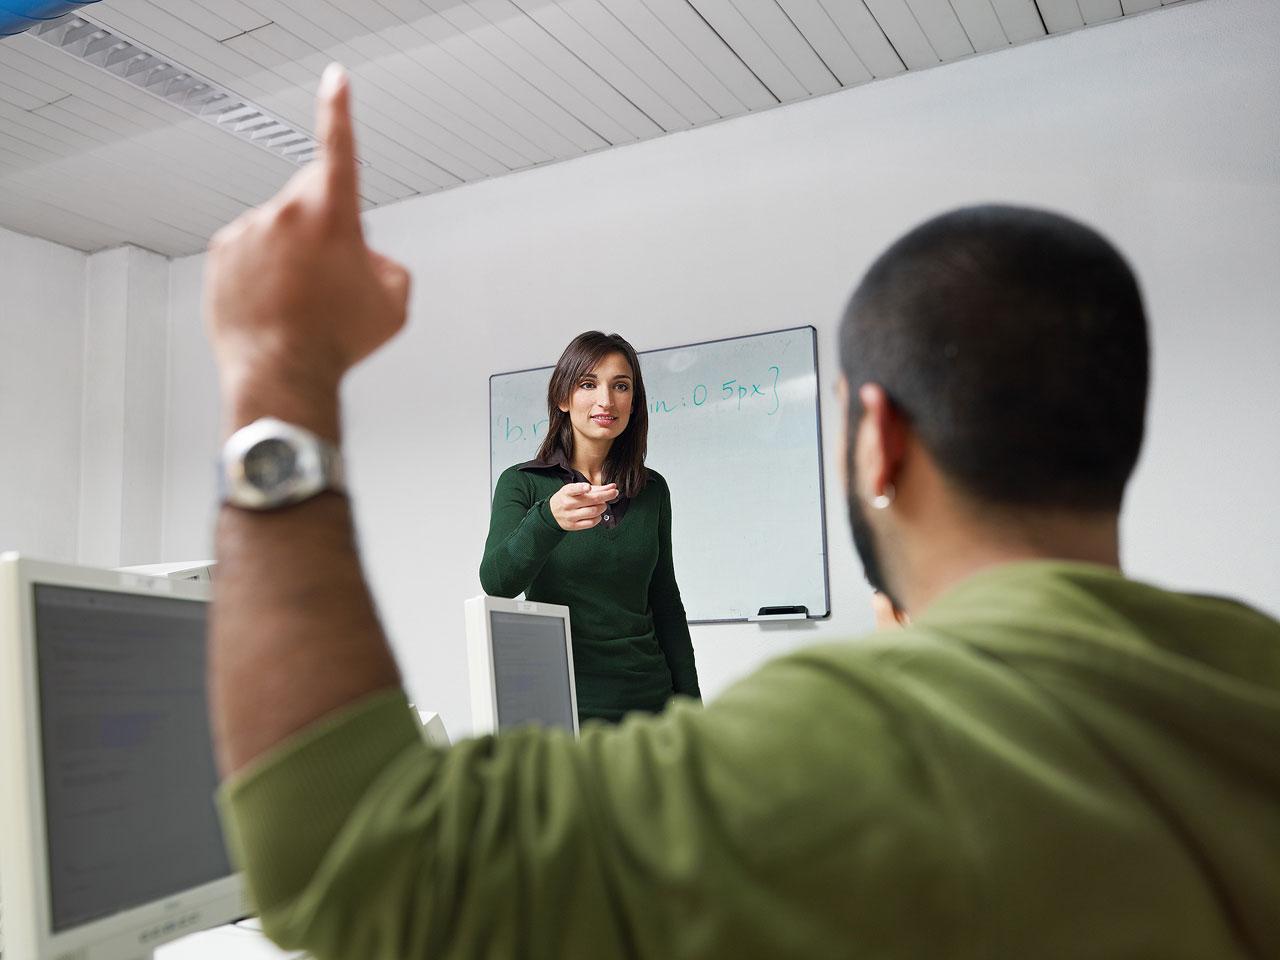 Hispanic student asking question to female teacher